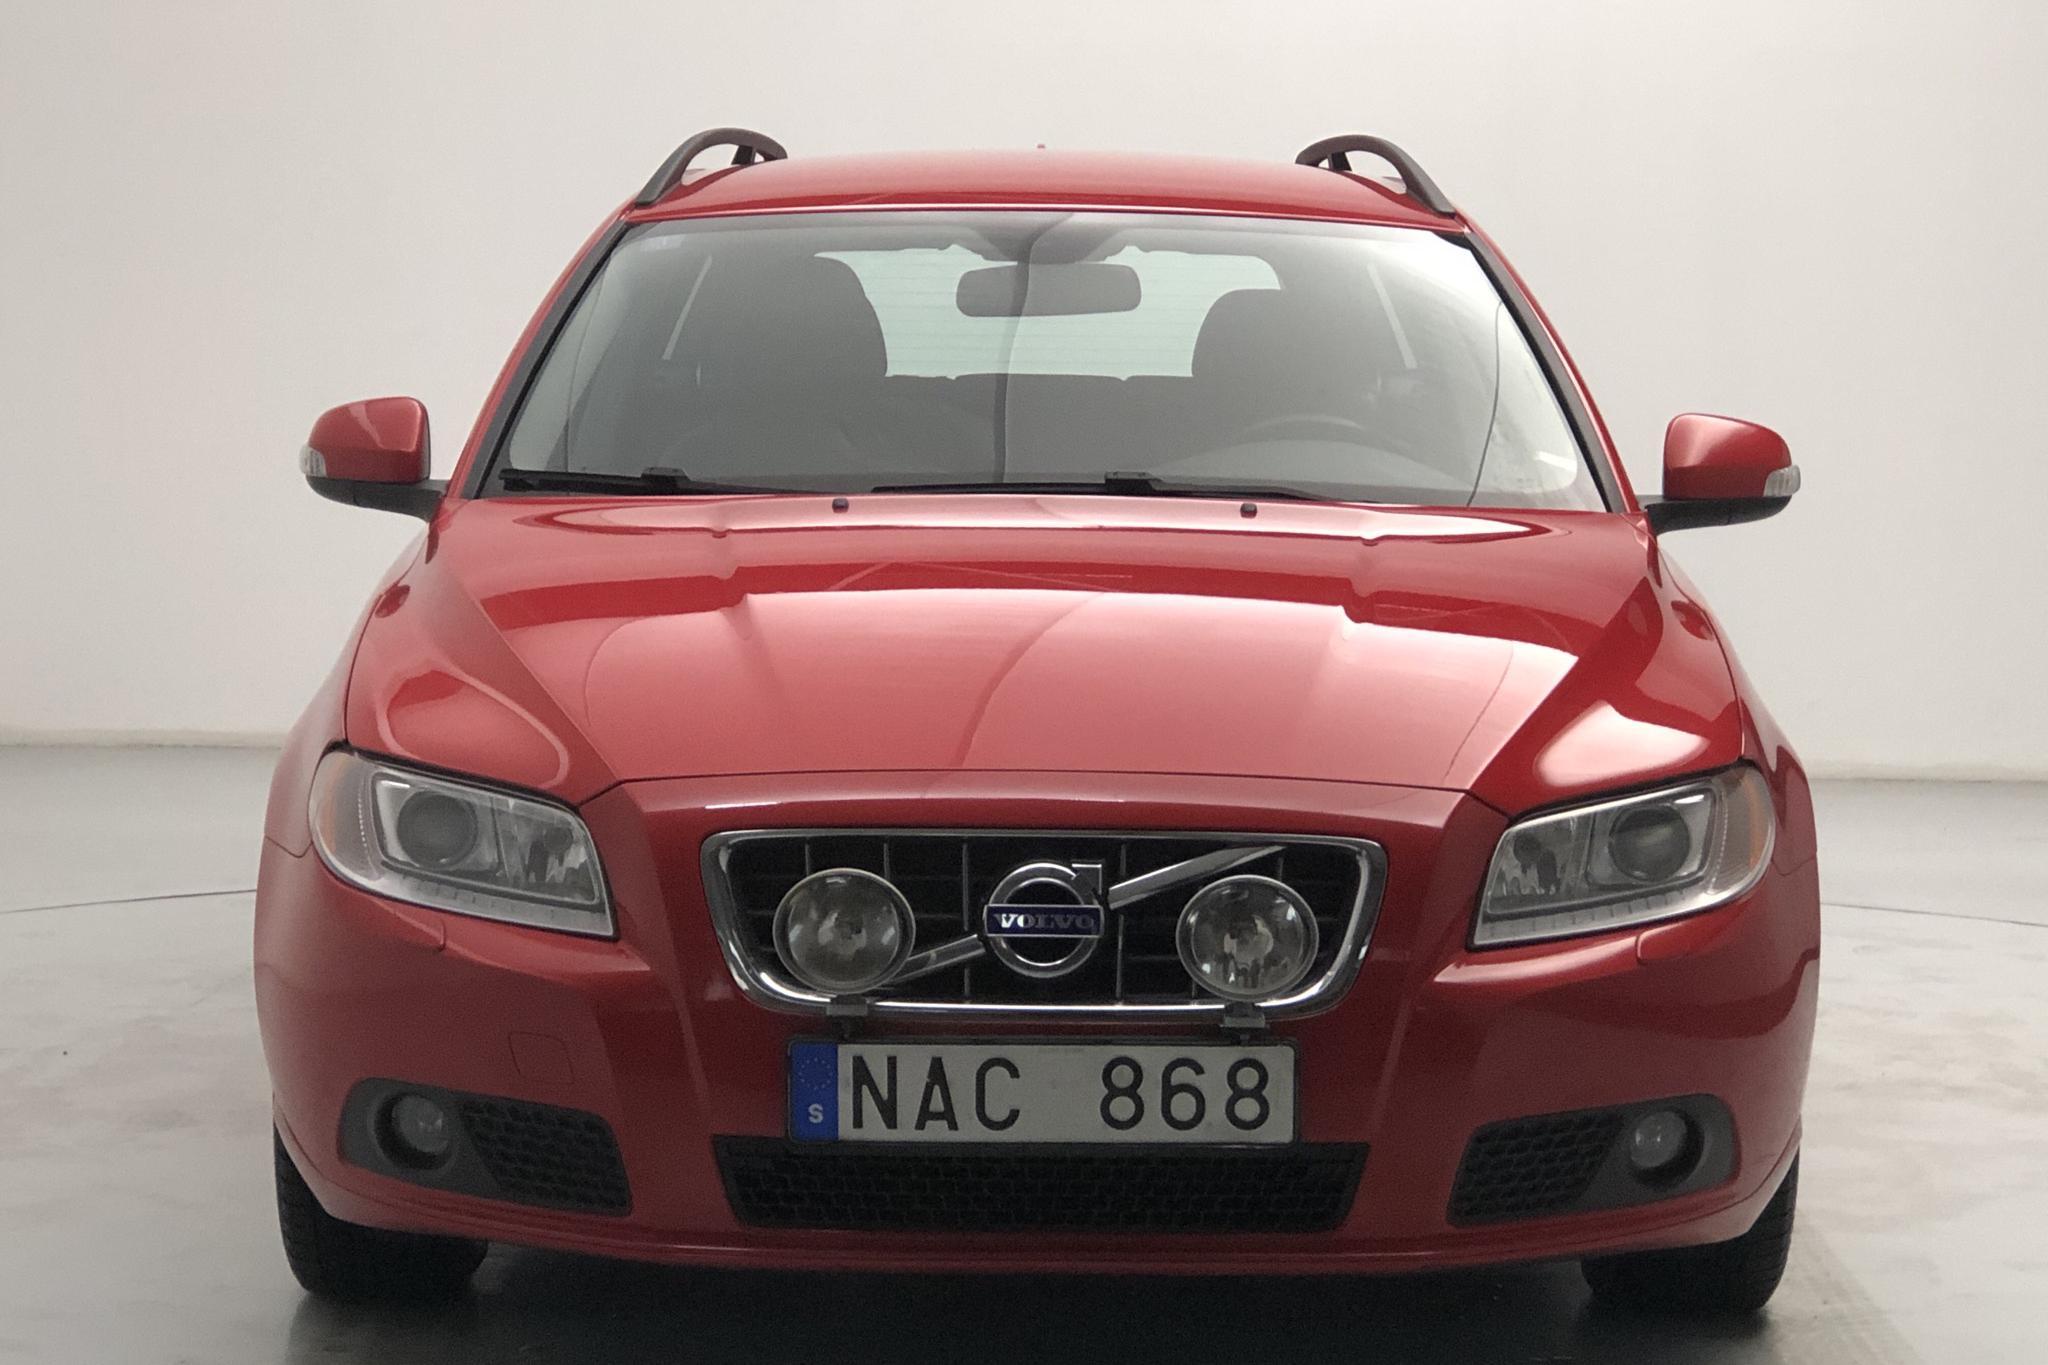 Volvo V70 II 1.6D DRIVe (109hk) - 13 575 mil - Manuell - röd - 2010